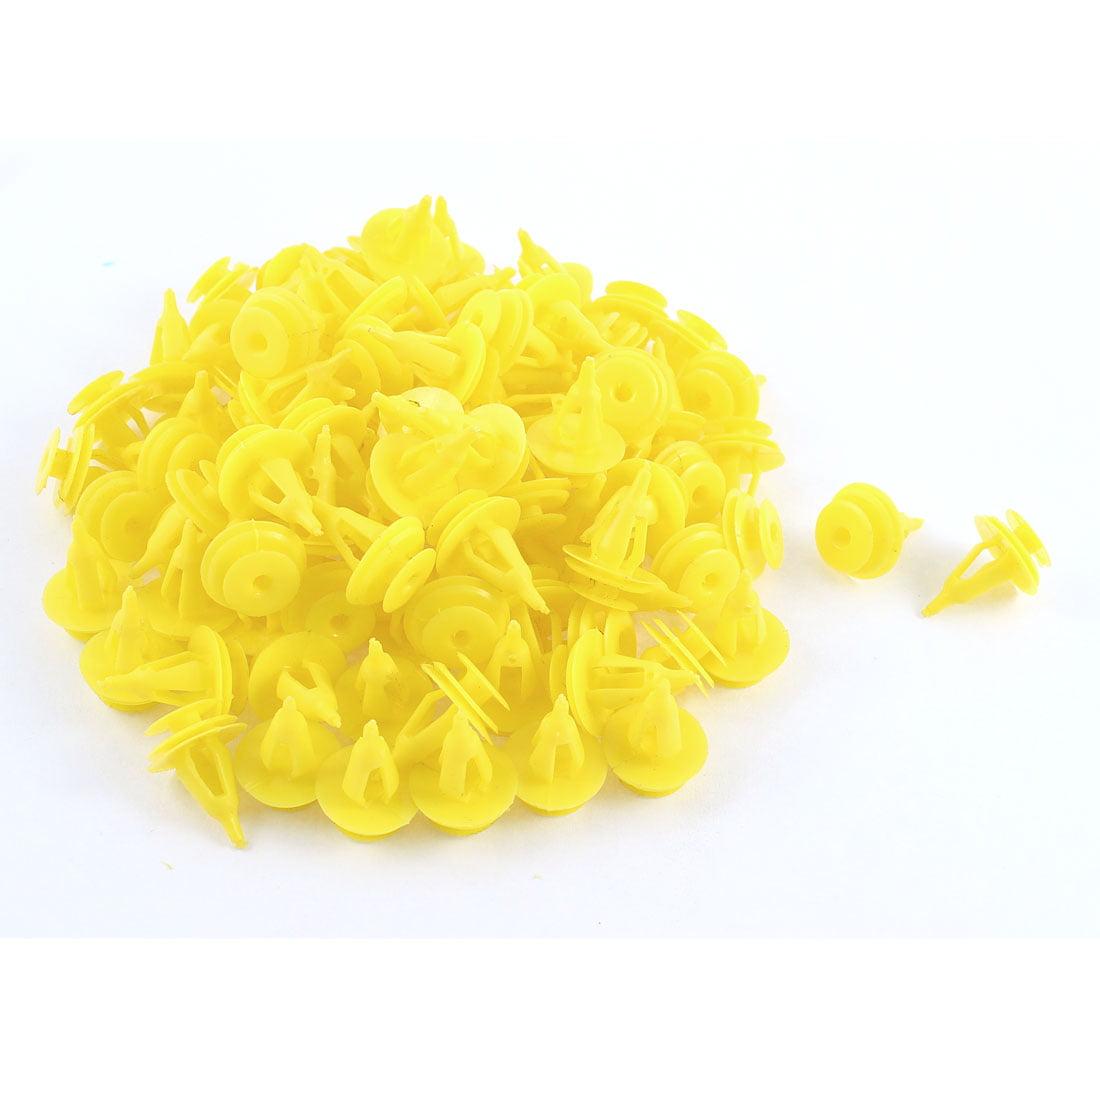 100 Pcs Yellow Plastic Rivet Trim Fastener Retainer Clips 9mm x 17mm x 18mm